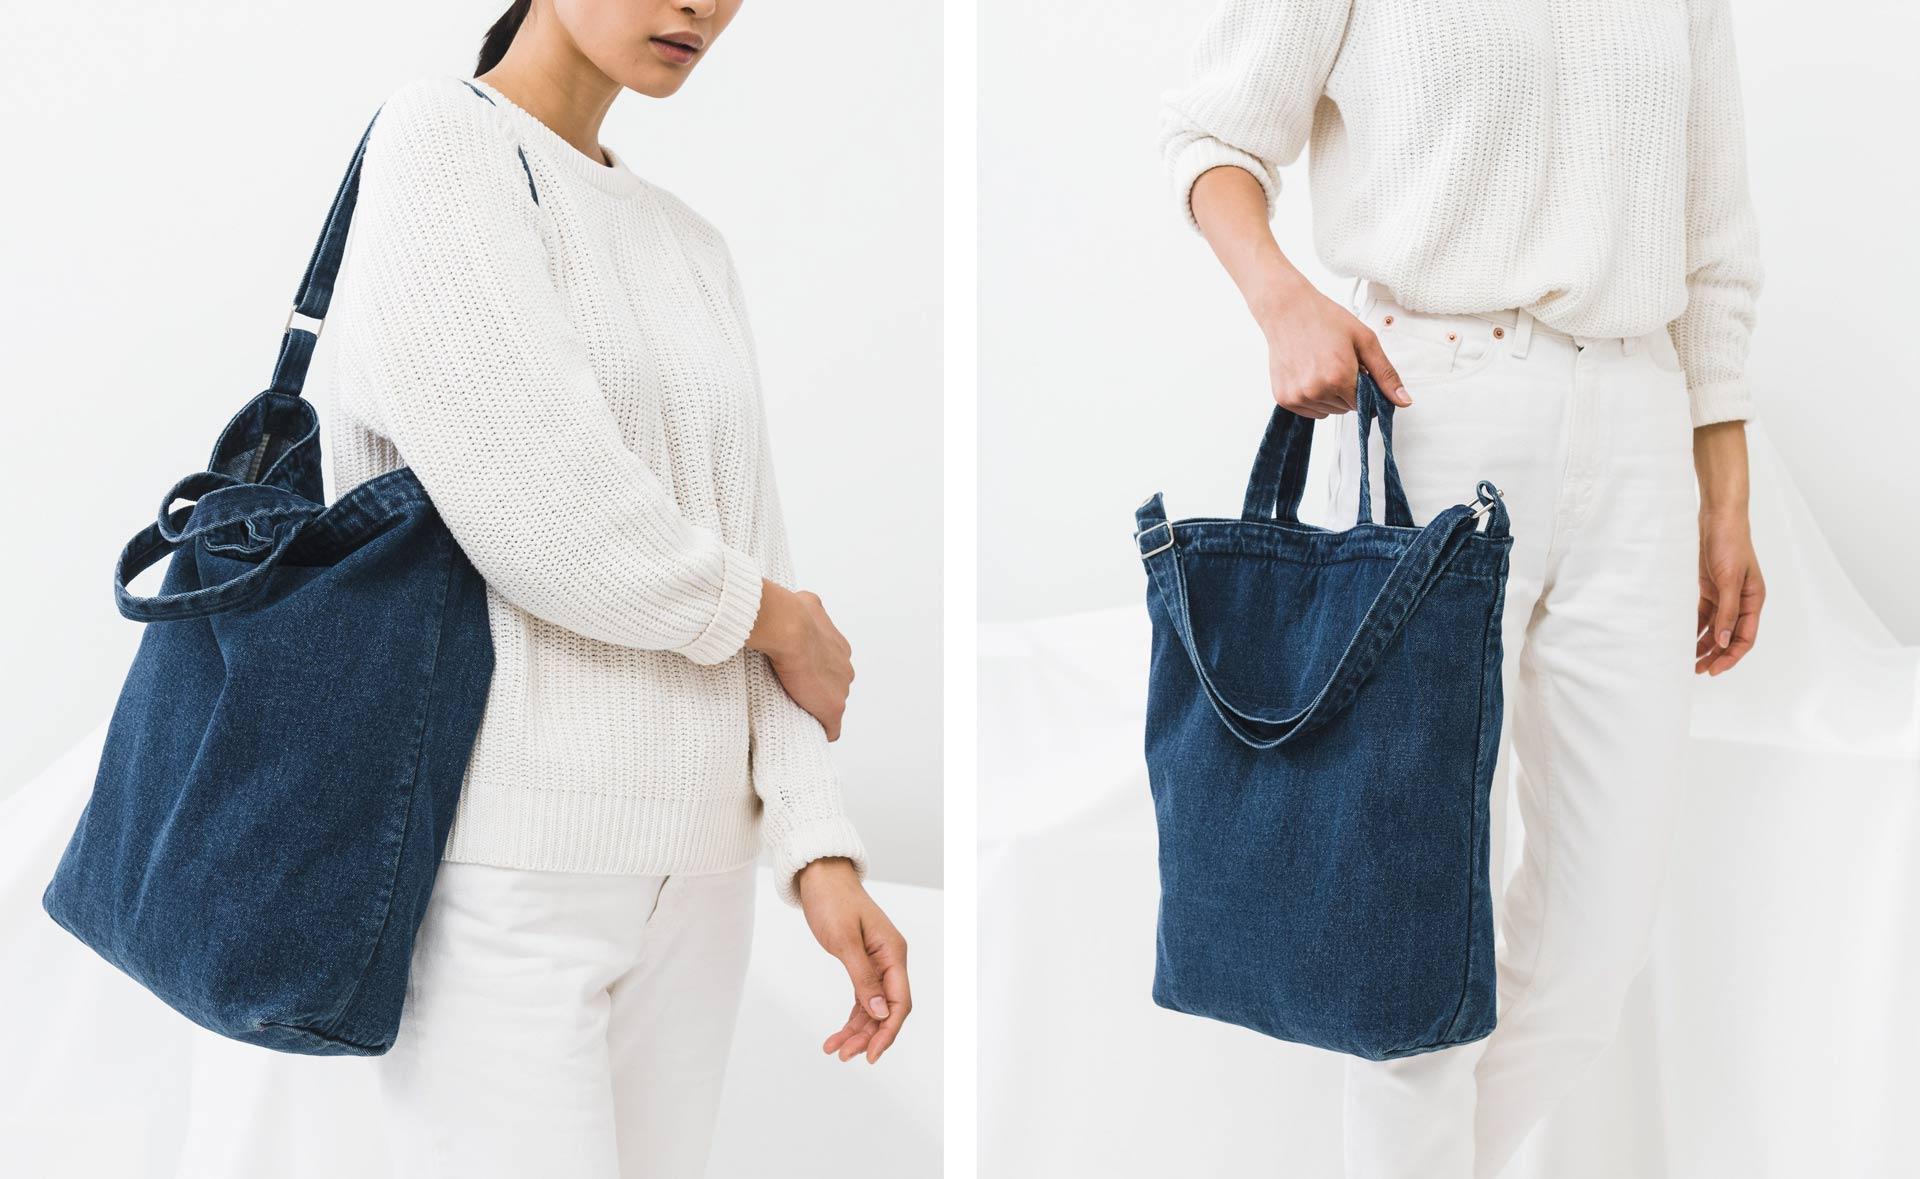 denim-duck-bag-2-garment-washed-denim-dark-02.jpg